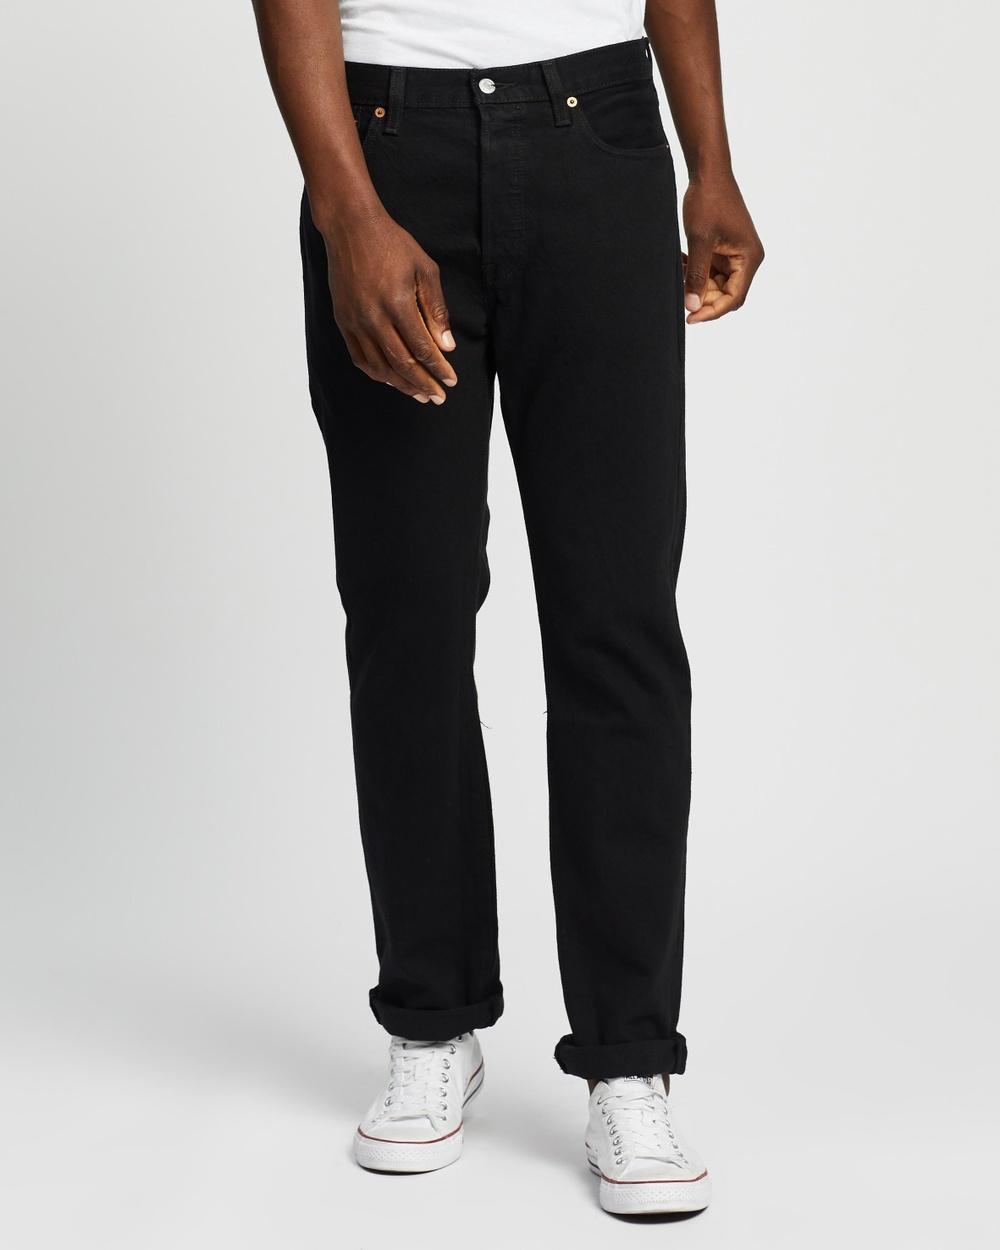 Levi's 501® Original Jeans Black